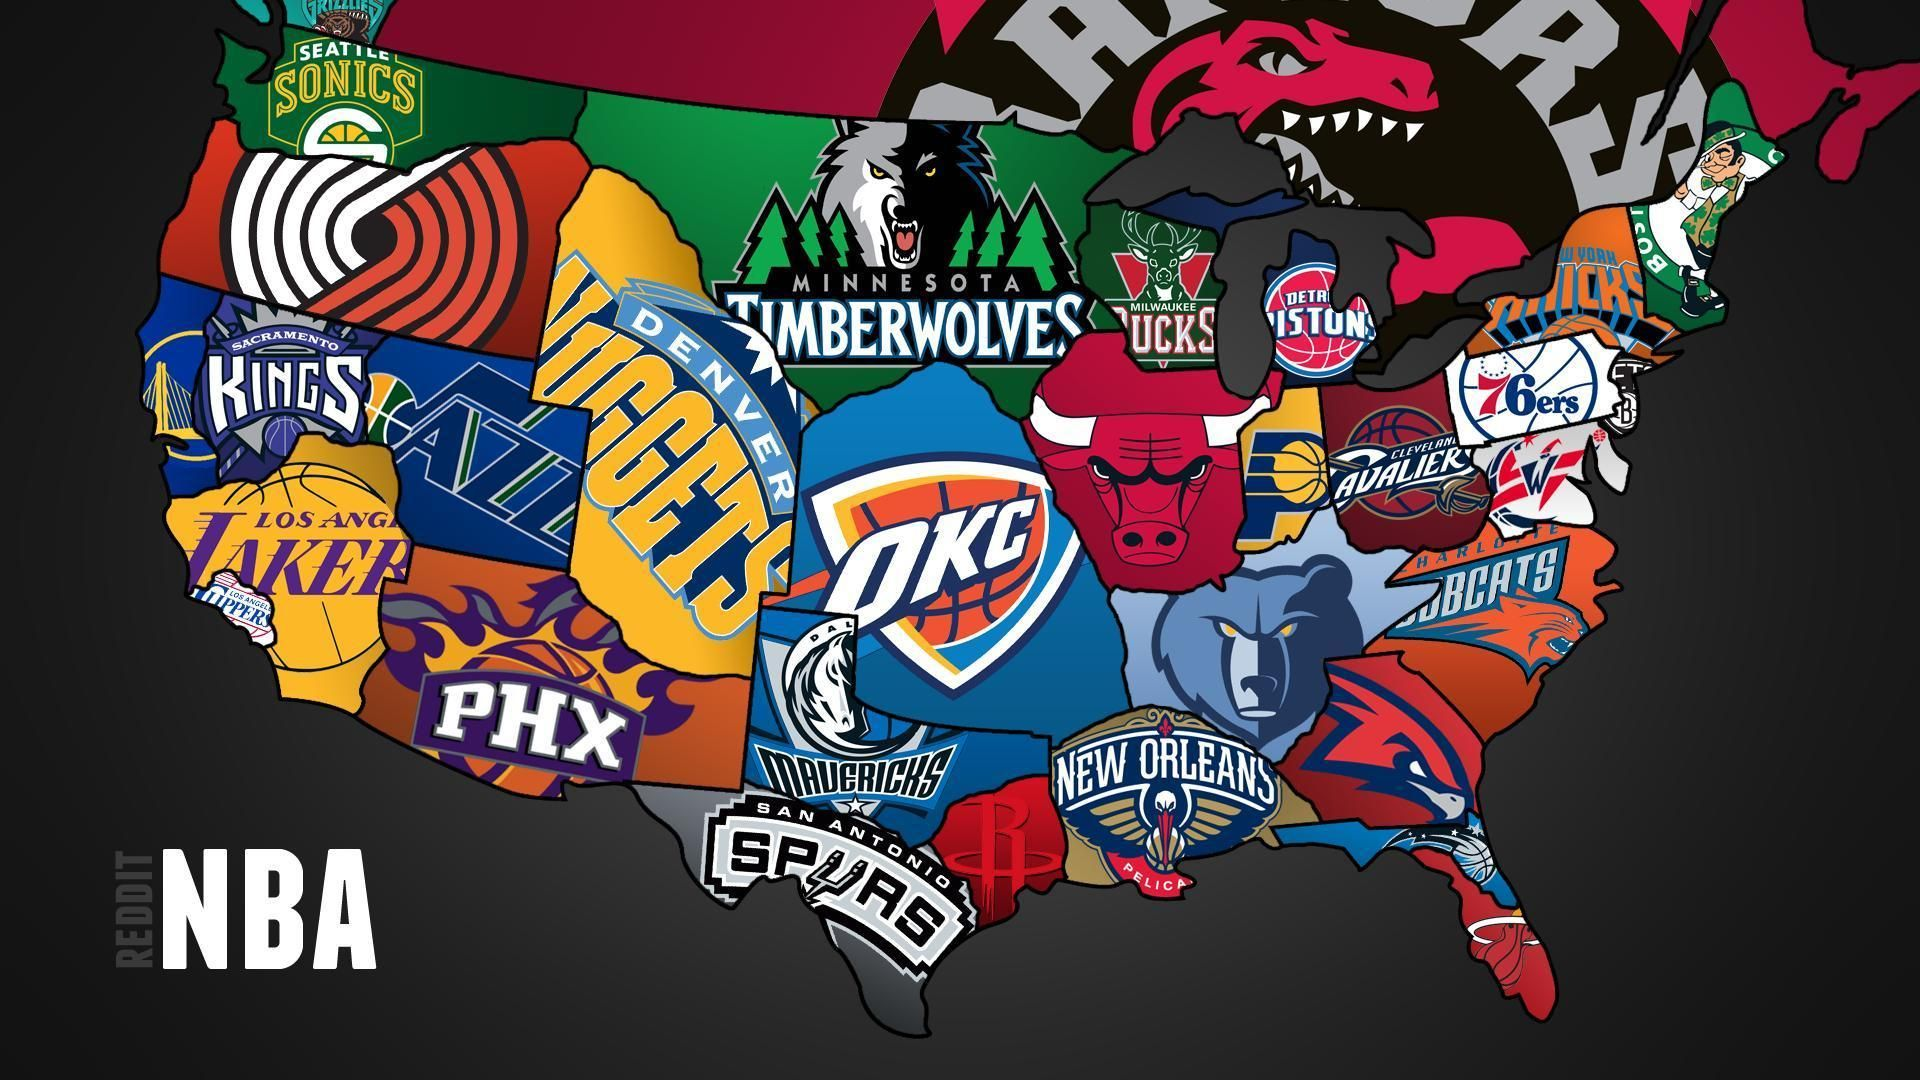 Desktophdwallpaper Org Nba Basketball Teams Nba Teams Nba Wallpapers